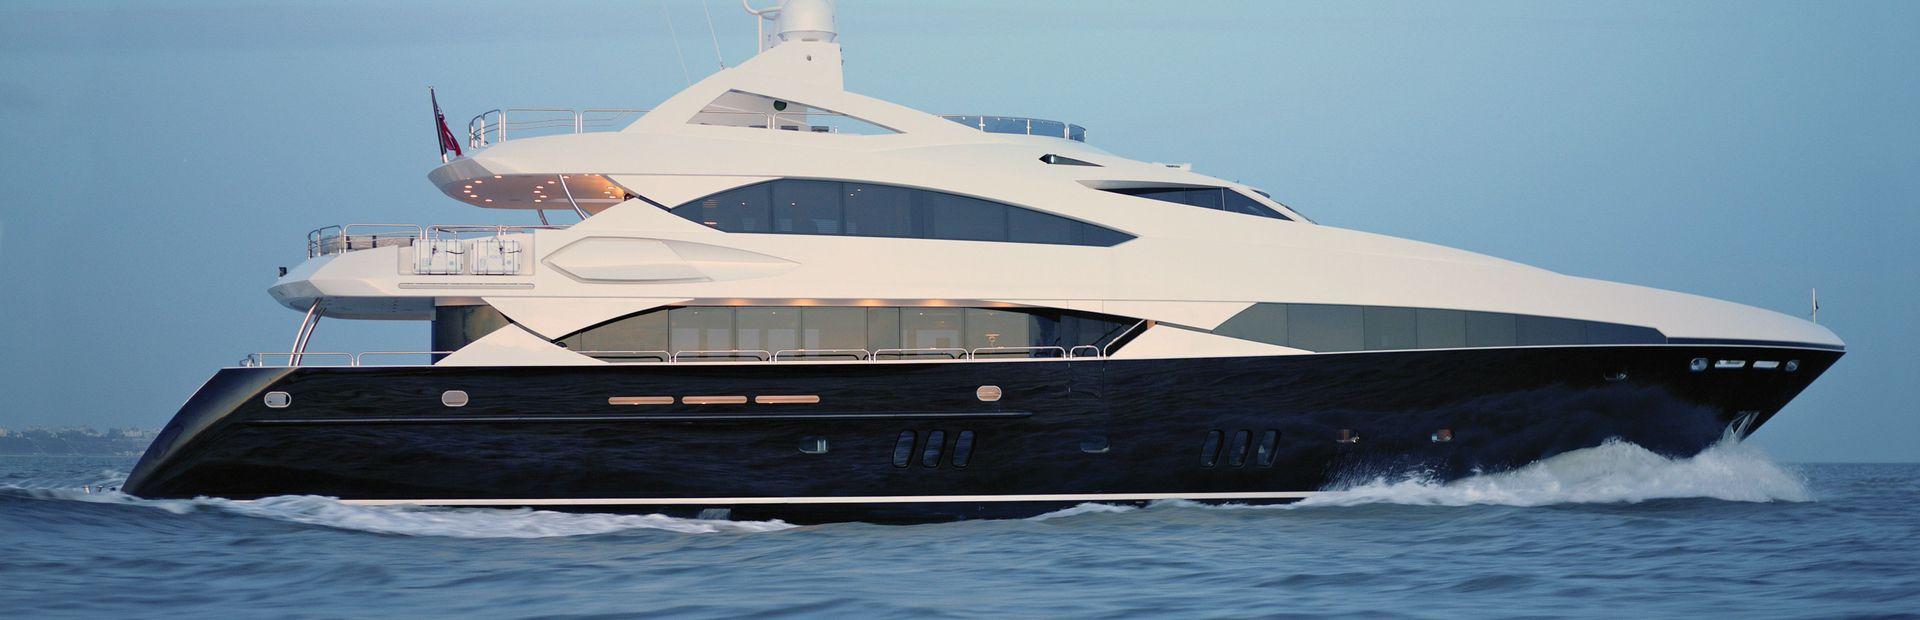 37 Metre Yacht Yacht Charter